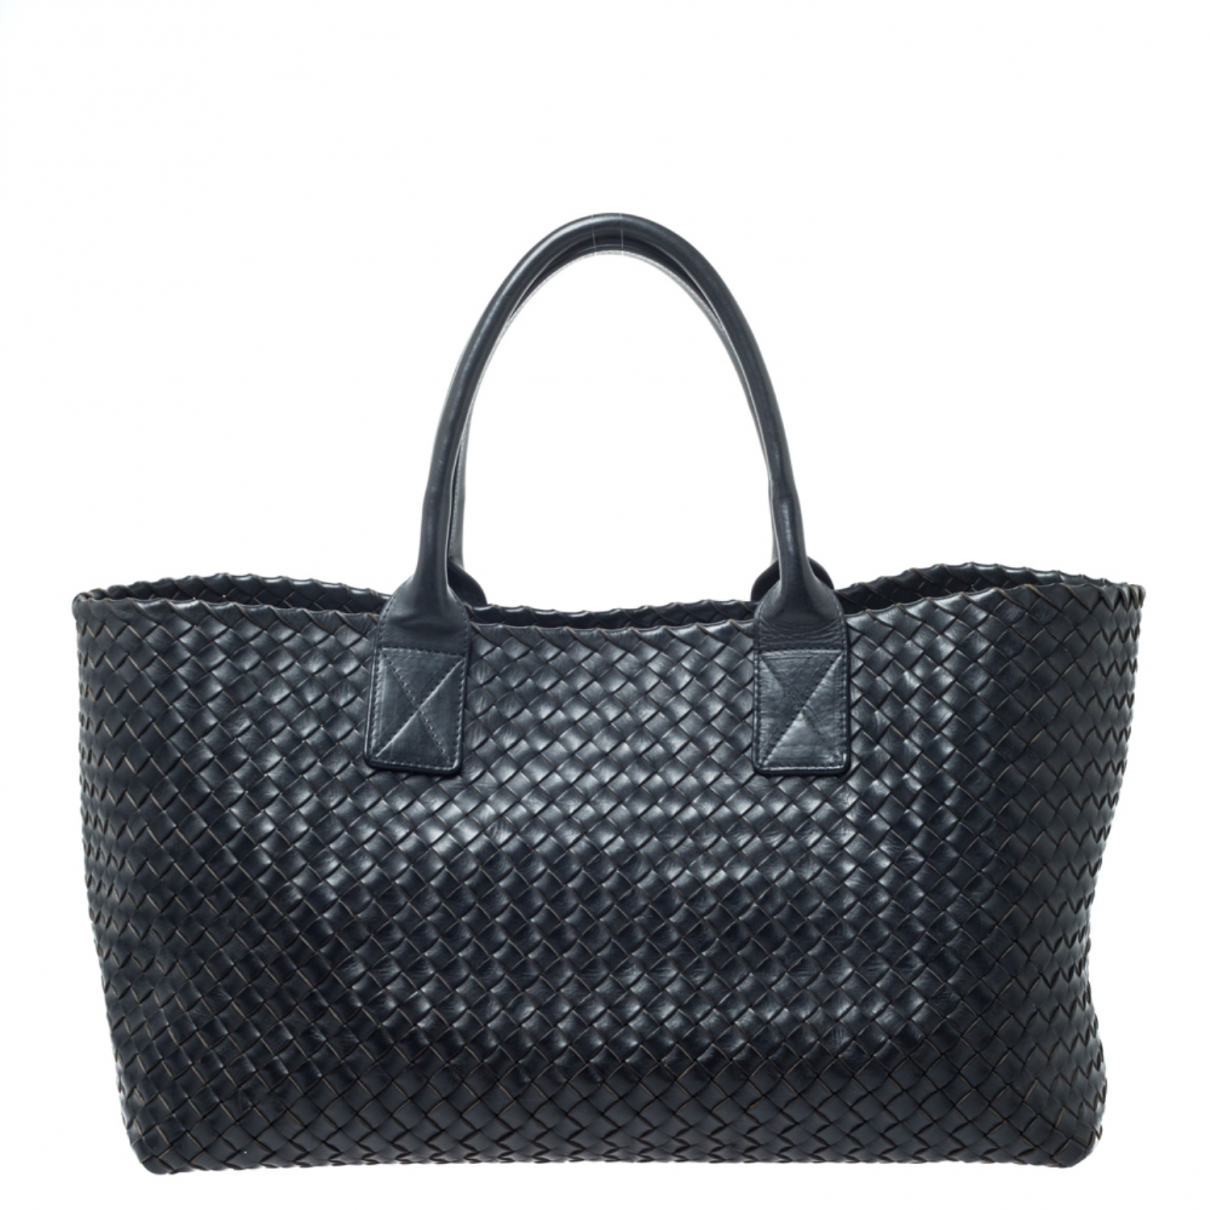 Bottega Veneta Cabat Black Leather handbag for Women \N